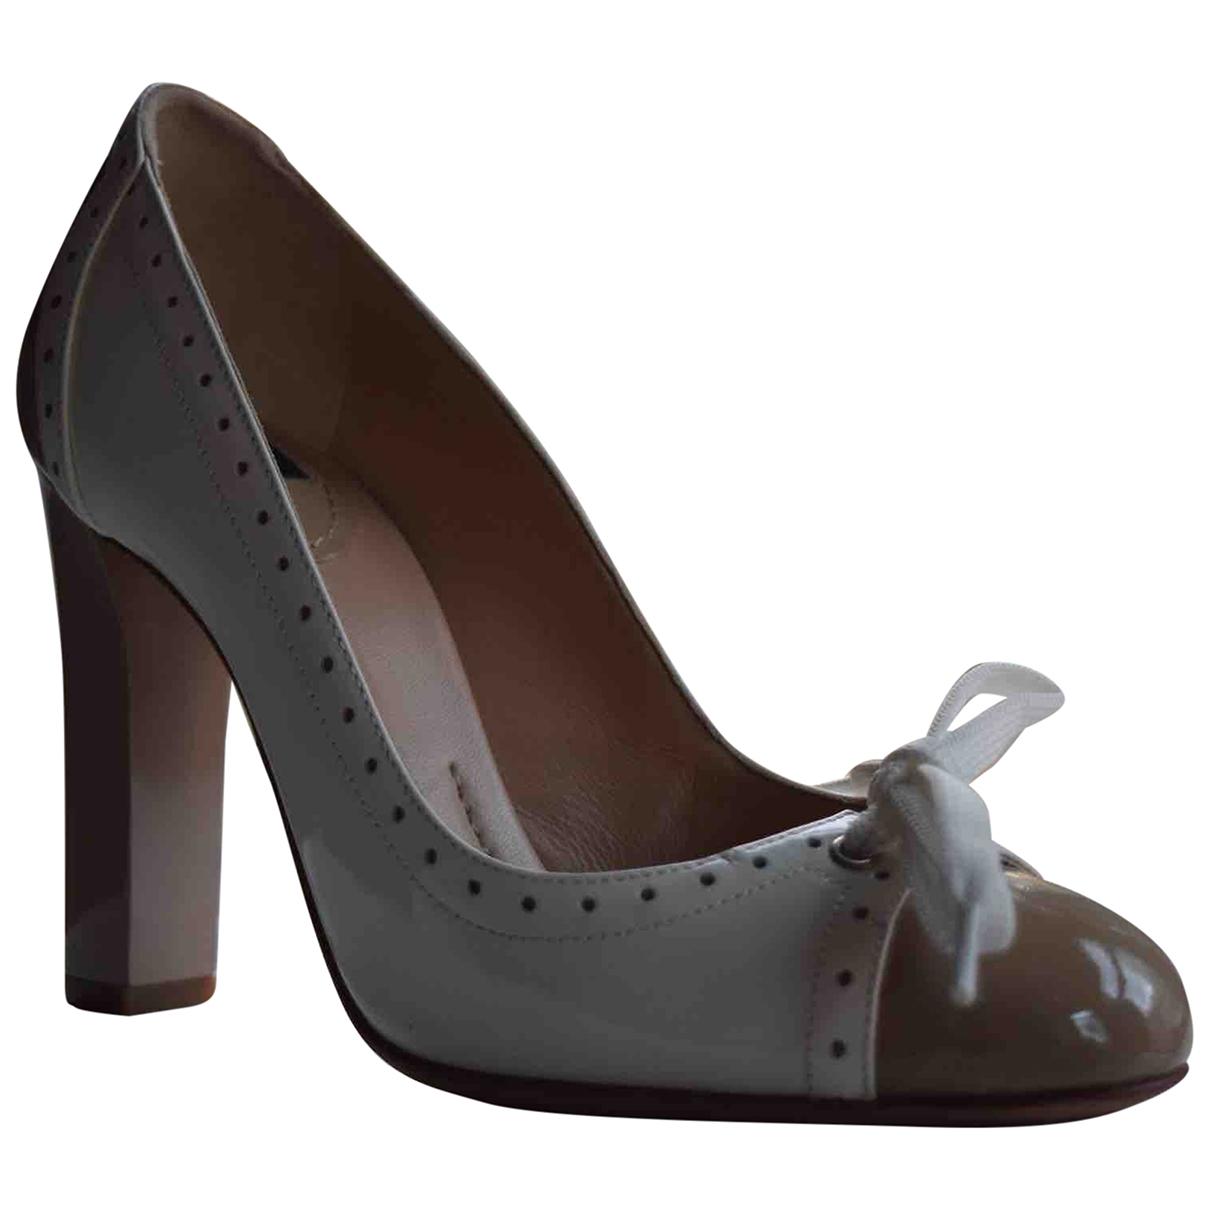 D&g \N Multicolour Patent leather Heels for Women 36 EU